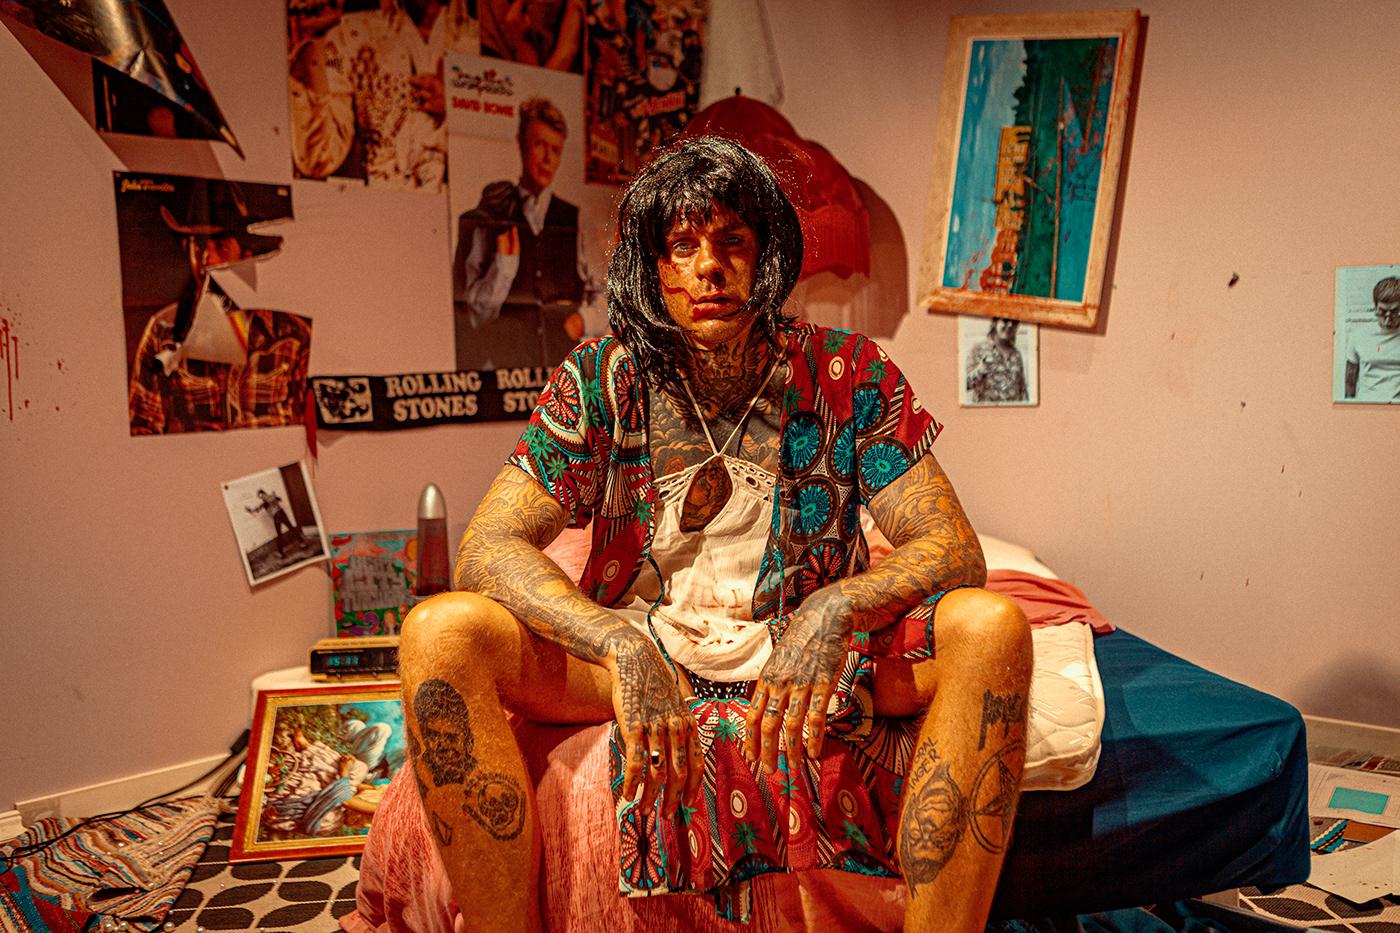 60s 70s bandphotos grease portraits pr photo Retro rock n roll Rockstar